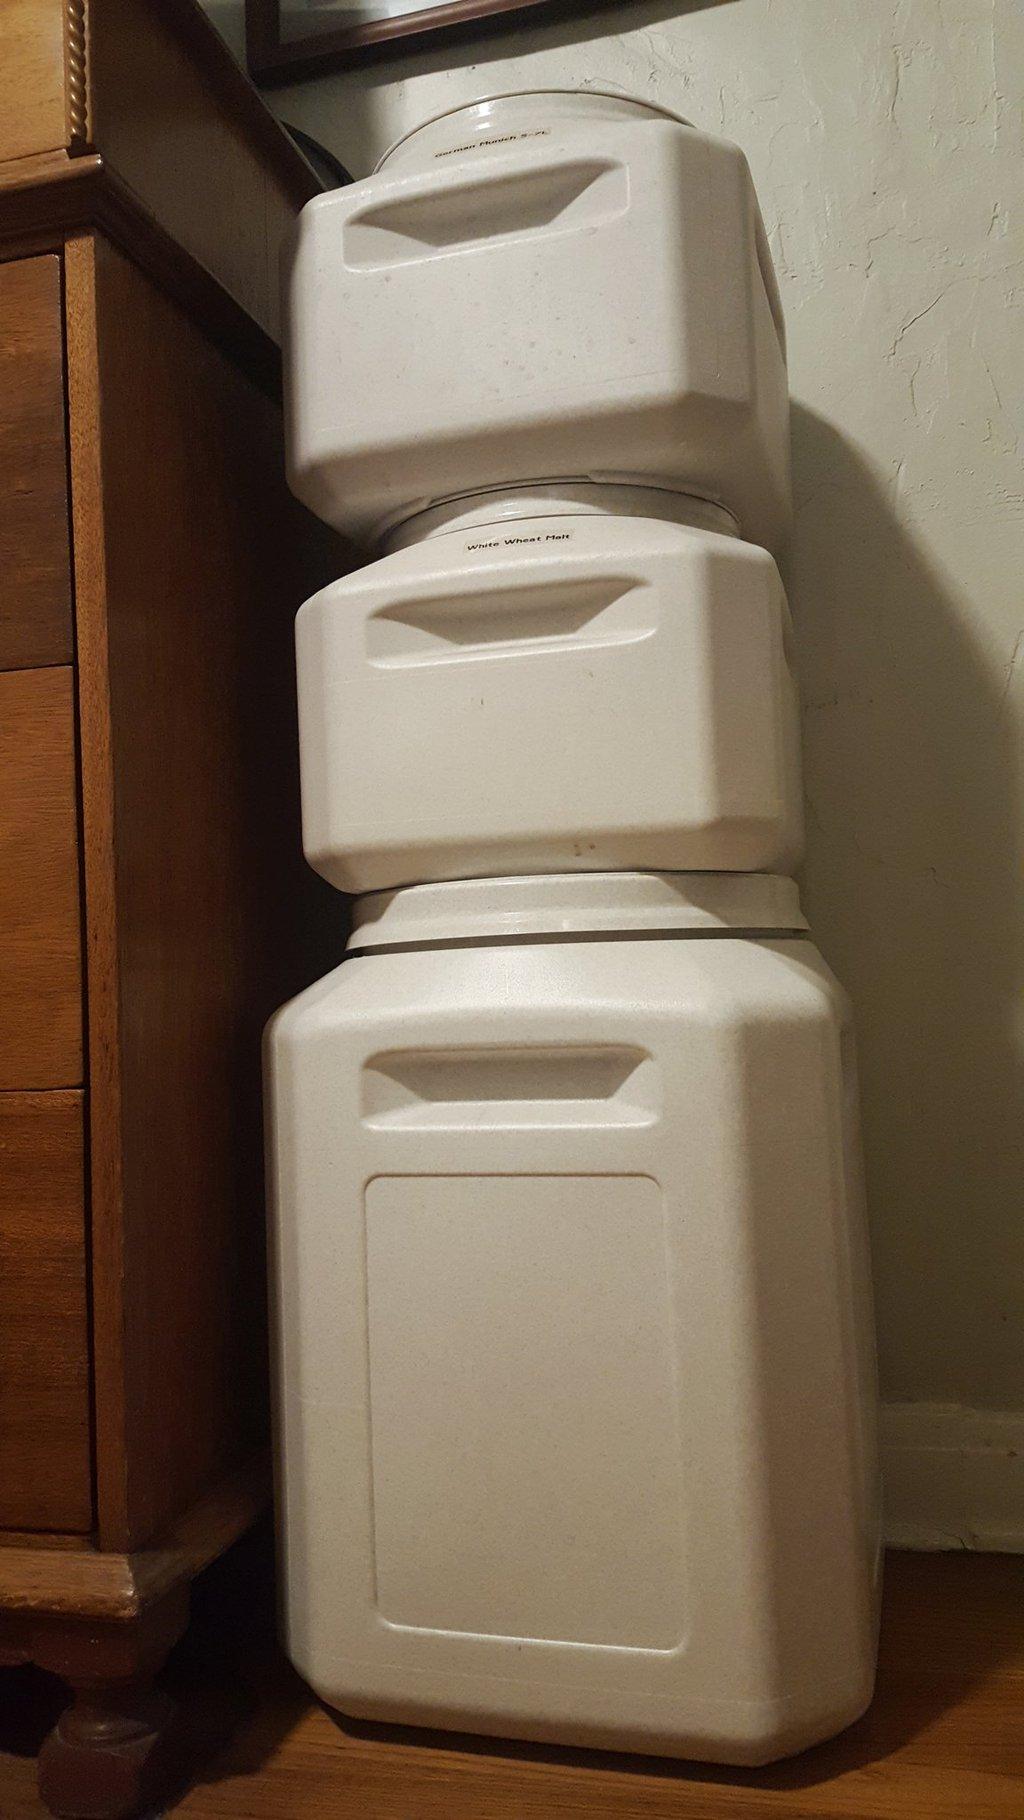 50 lb Stackable Airtight Container 55 lbs Grain Storage Capacity